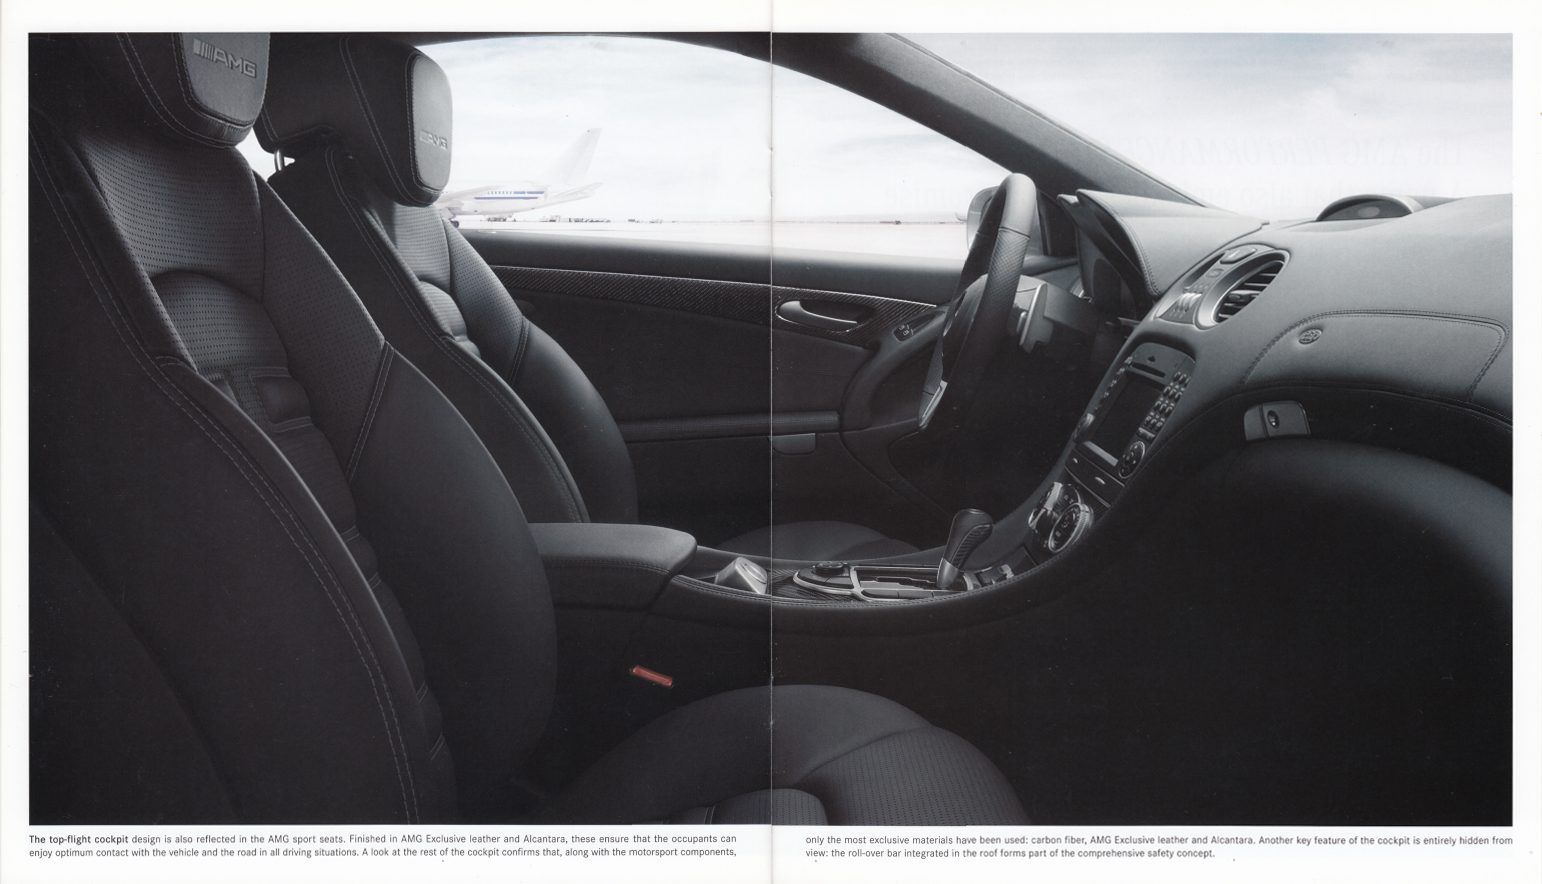 (R230): Catálogo SL65 AMG Black Series 2008 - inglês 009